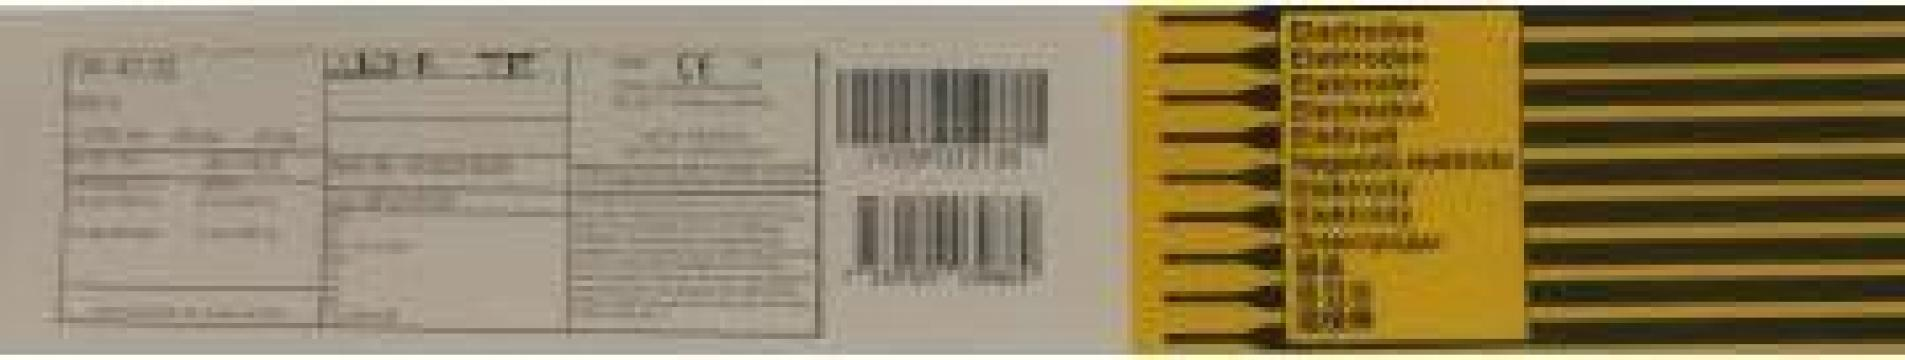 Electrozi rutilici OK 43.32, Esab, otel, 2.5x350mm, 4.8 kg de la Sudometal Srl